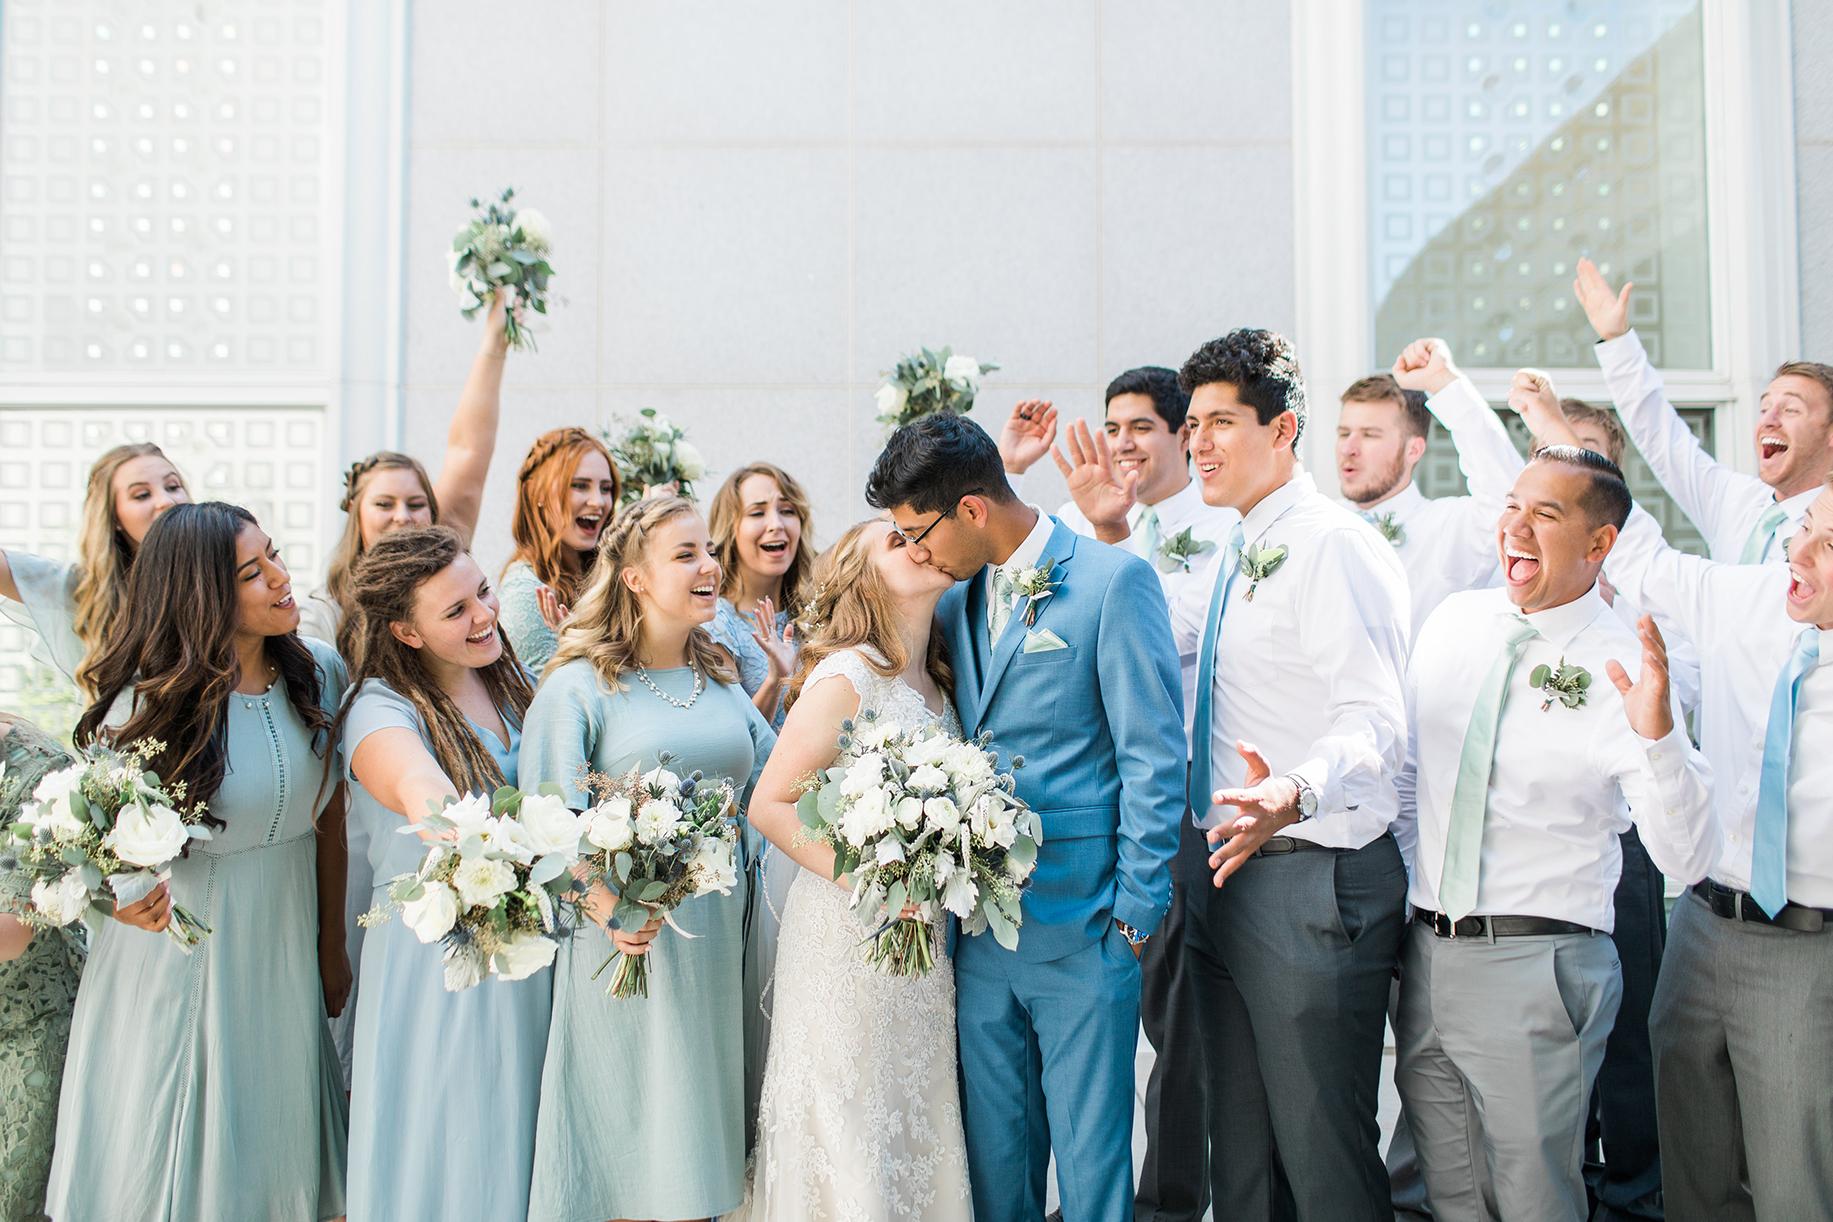 Dan Nikki Wedding August 31 2018-print-0205.jpg